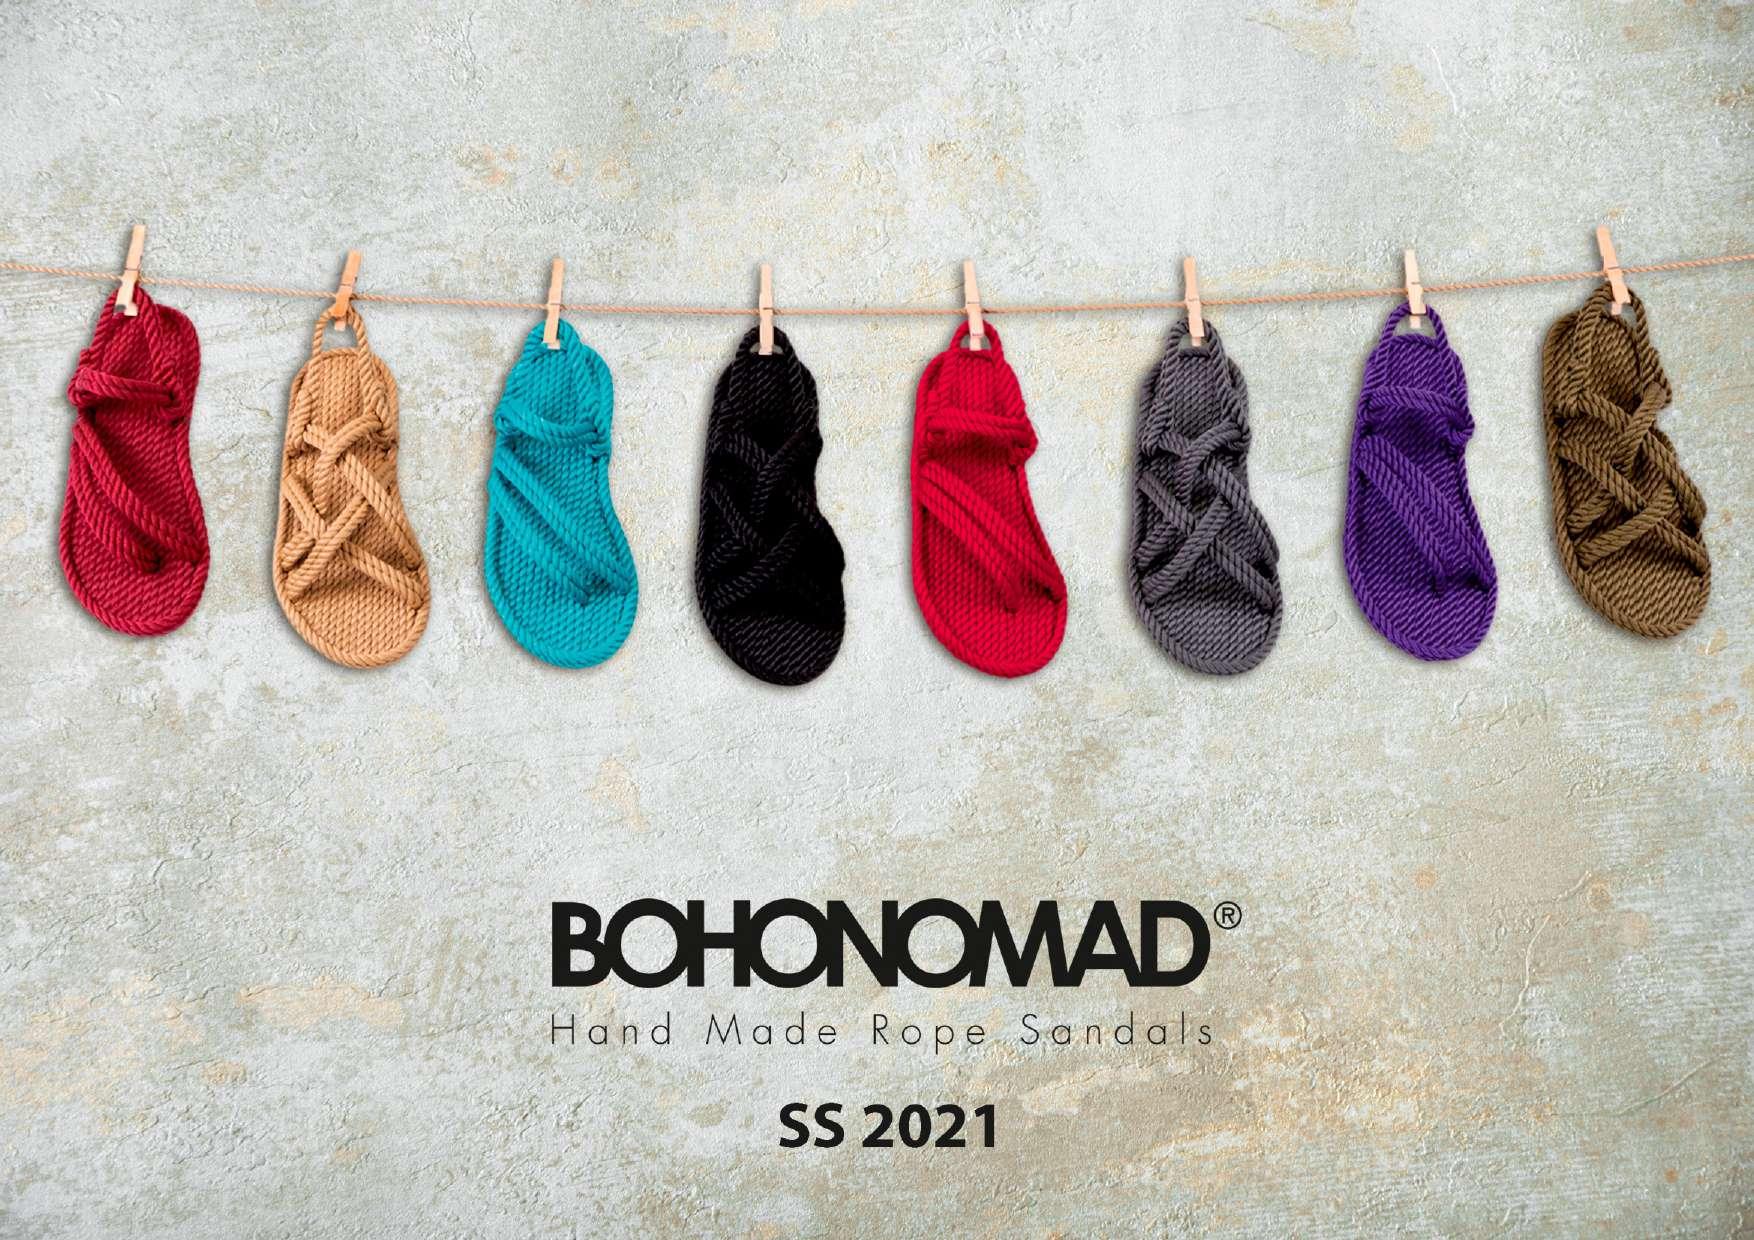 Bohonomad sandals